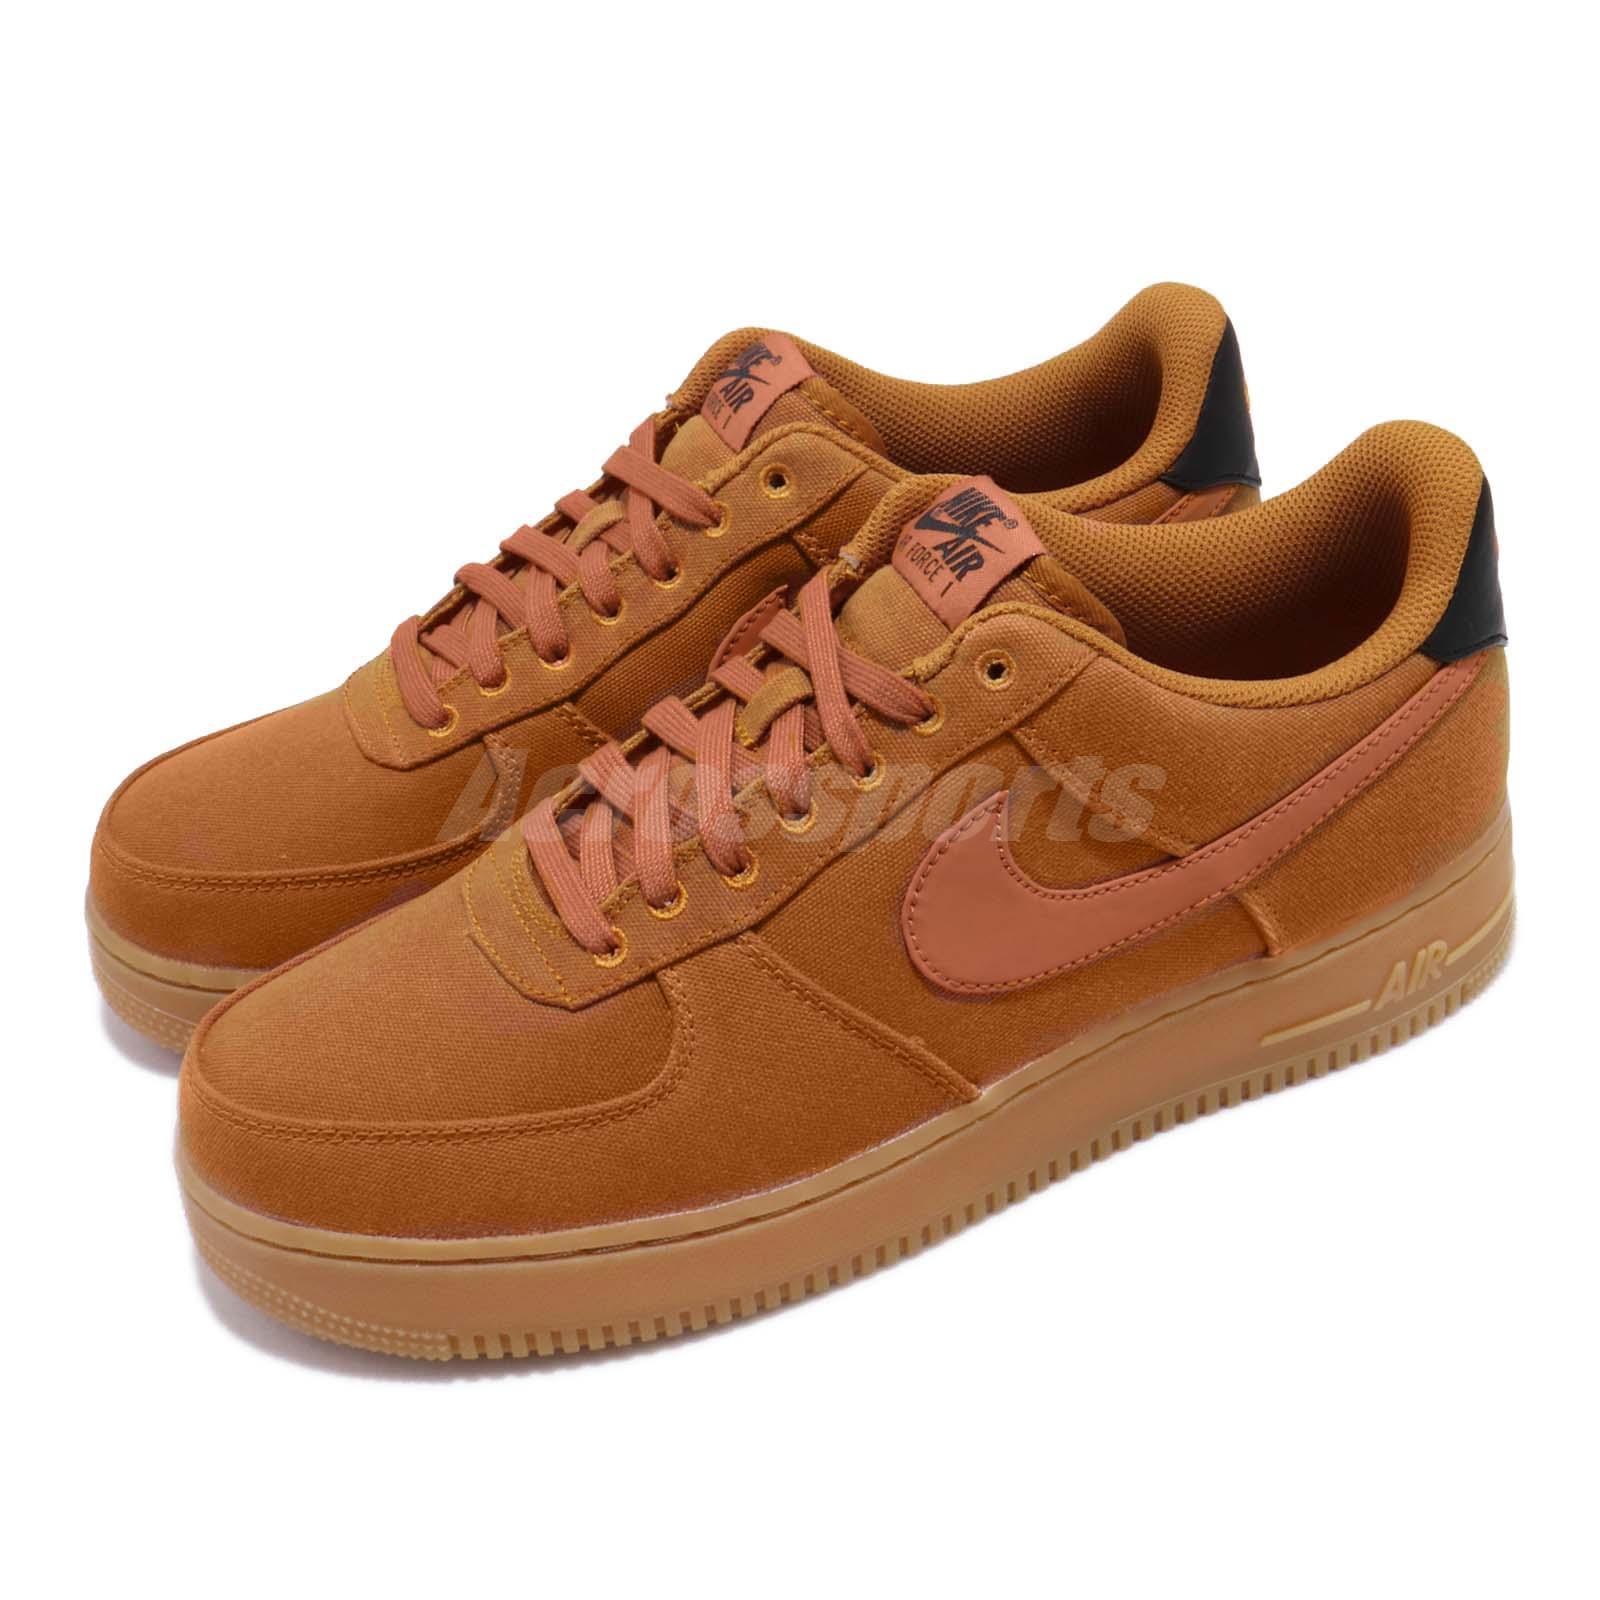 Details about Nike Air Force 1 07 LV8 Style Monarch Orange Brown Gum Mens Shoes AF1 AQ0117 800